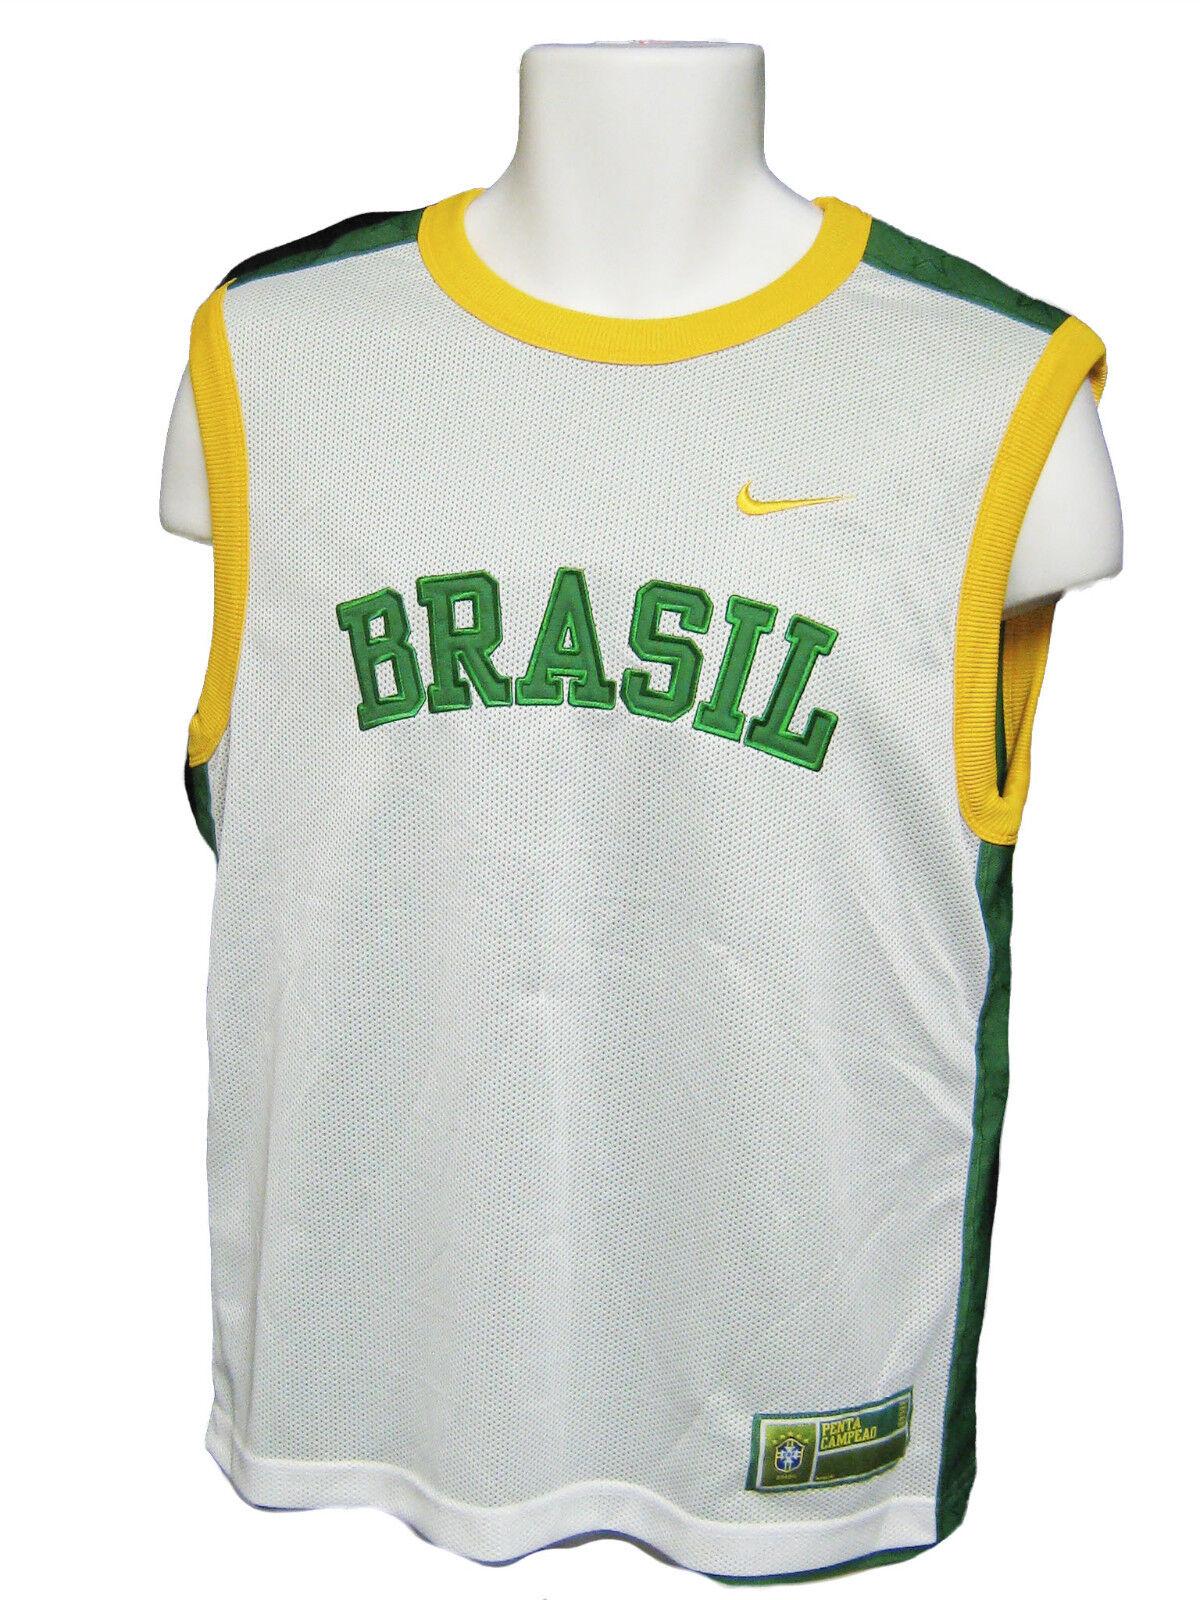 NIKE BRAZIL Dual Layer Reversible Football Training Vest Sleeveless Shirt  M